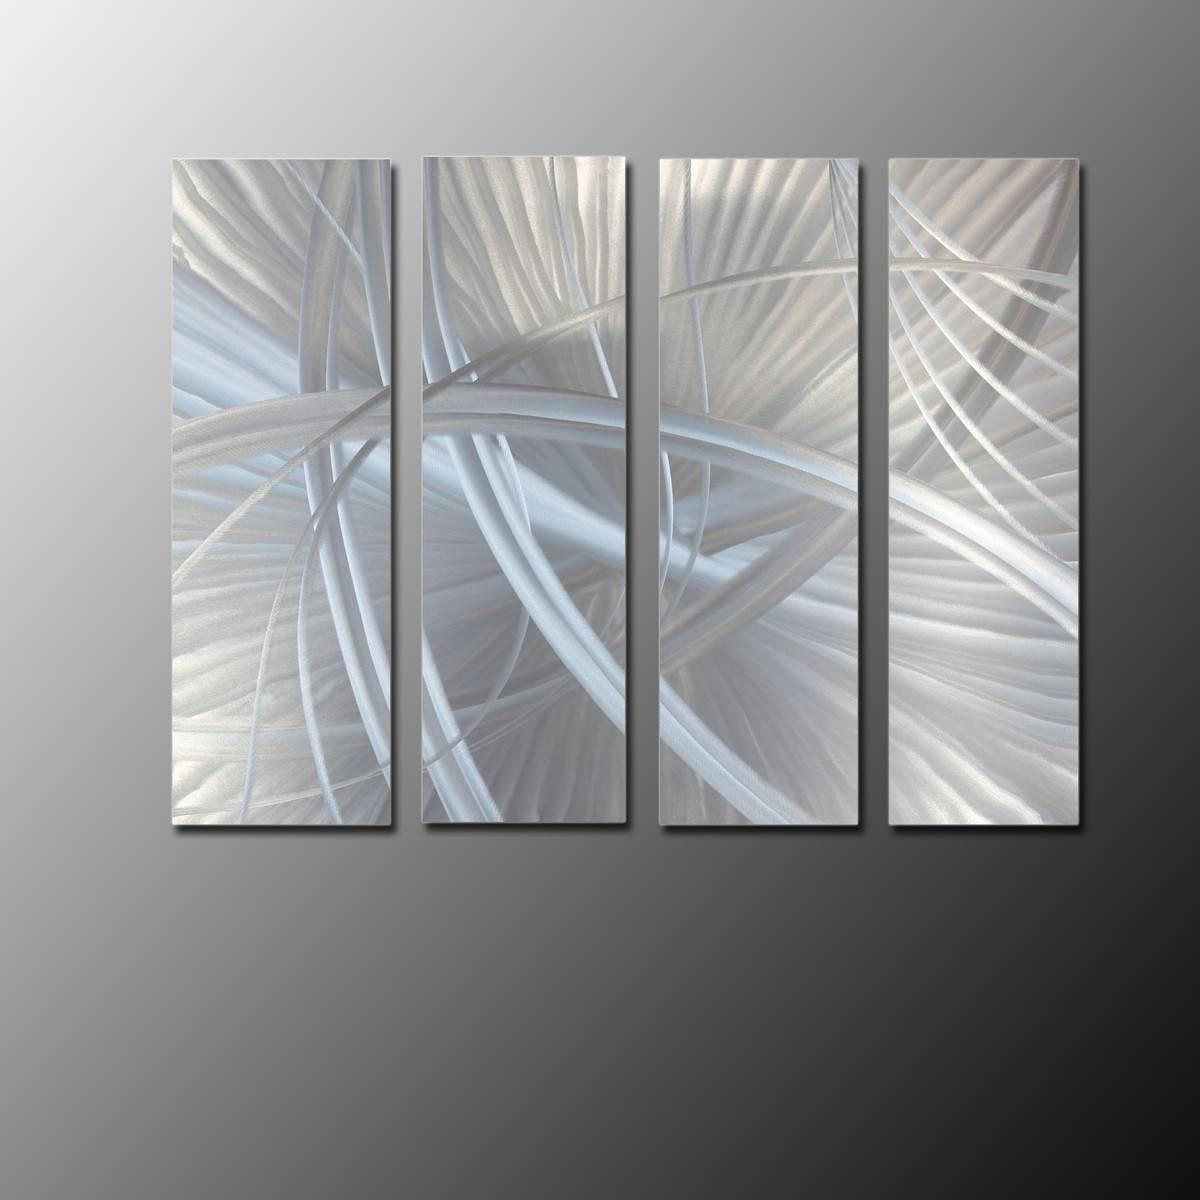 Decor : Best Decorative Metal Wall Art Panels Excellent Home For Recent Metal Wall Art Panels (View 4 of 20)